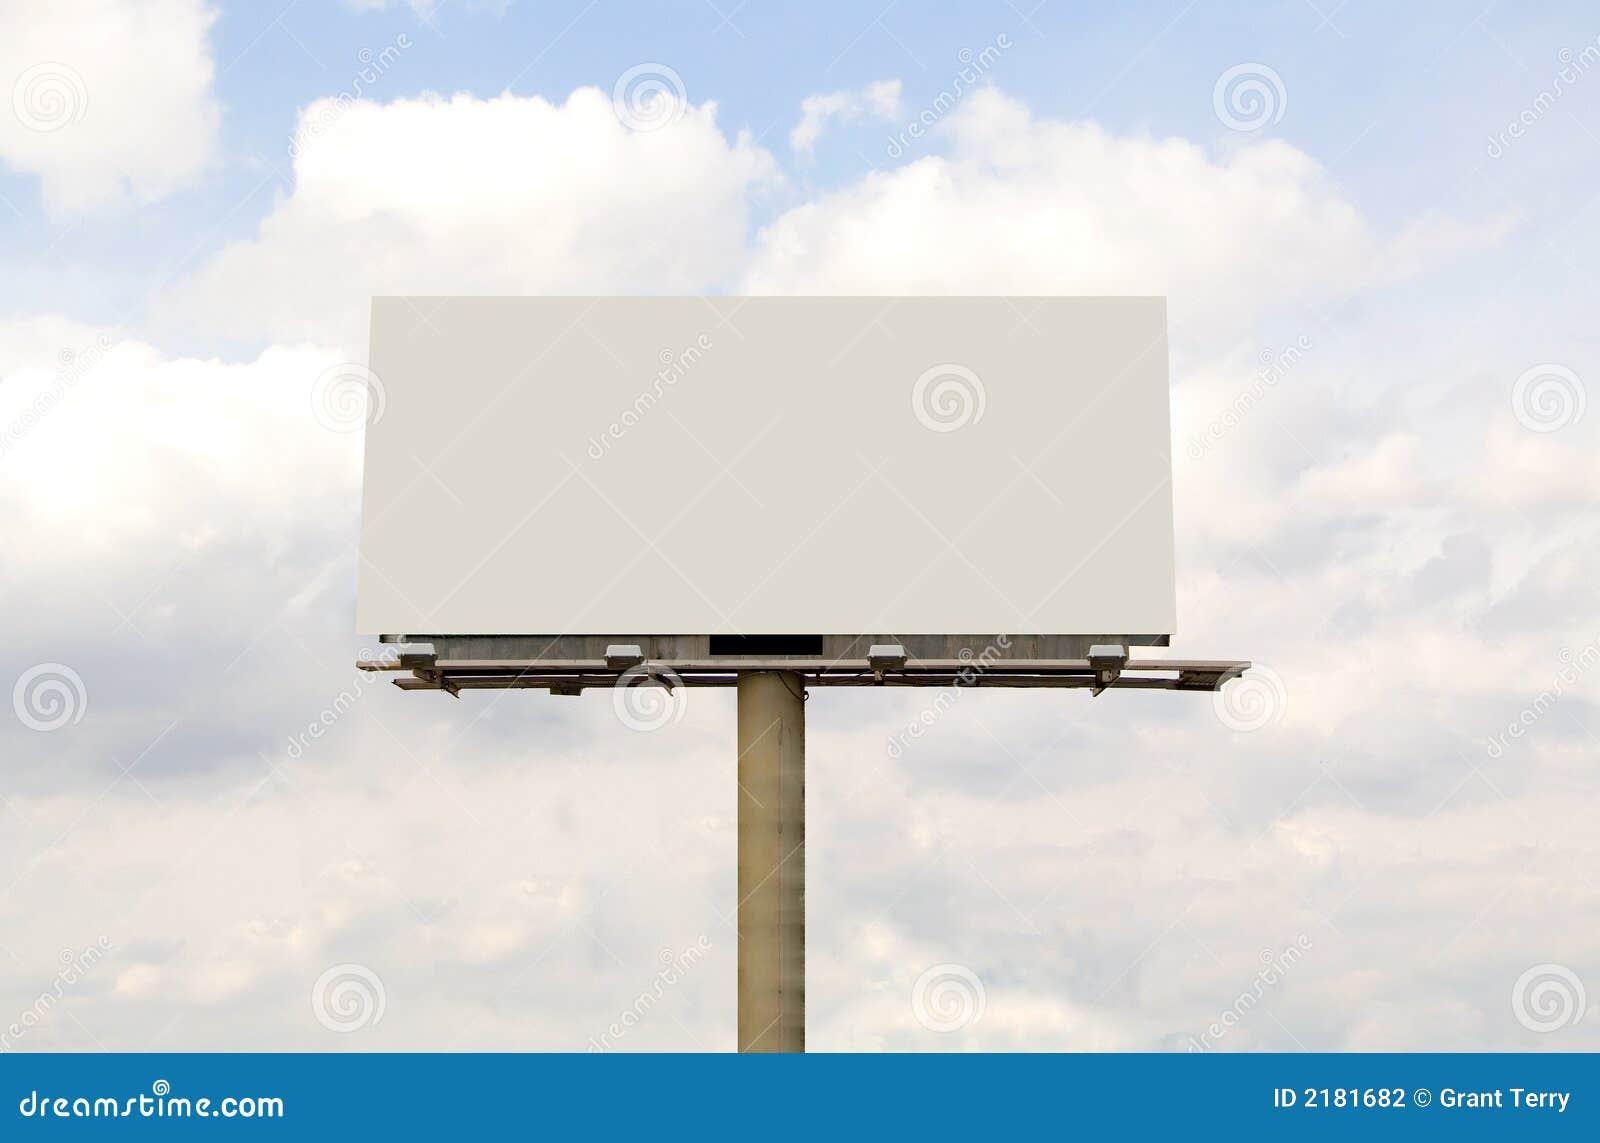 Blank Billboard Stock Photography - Image: 2181682